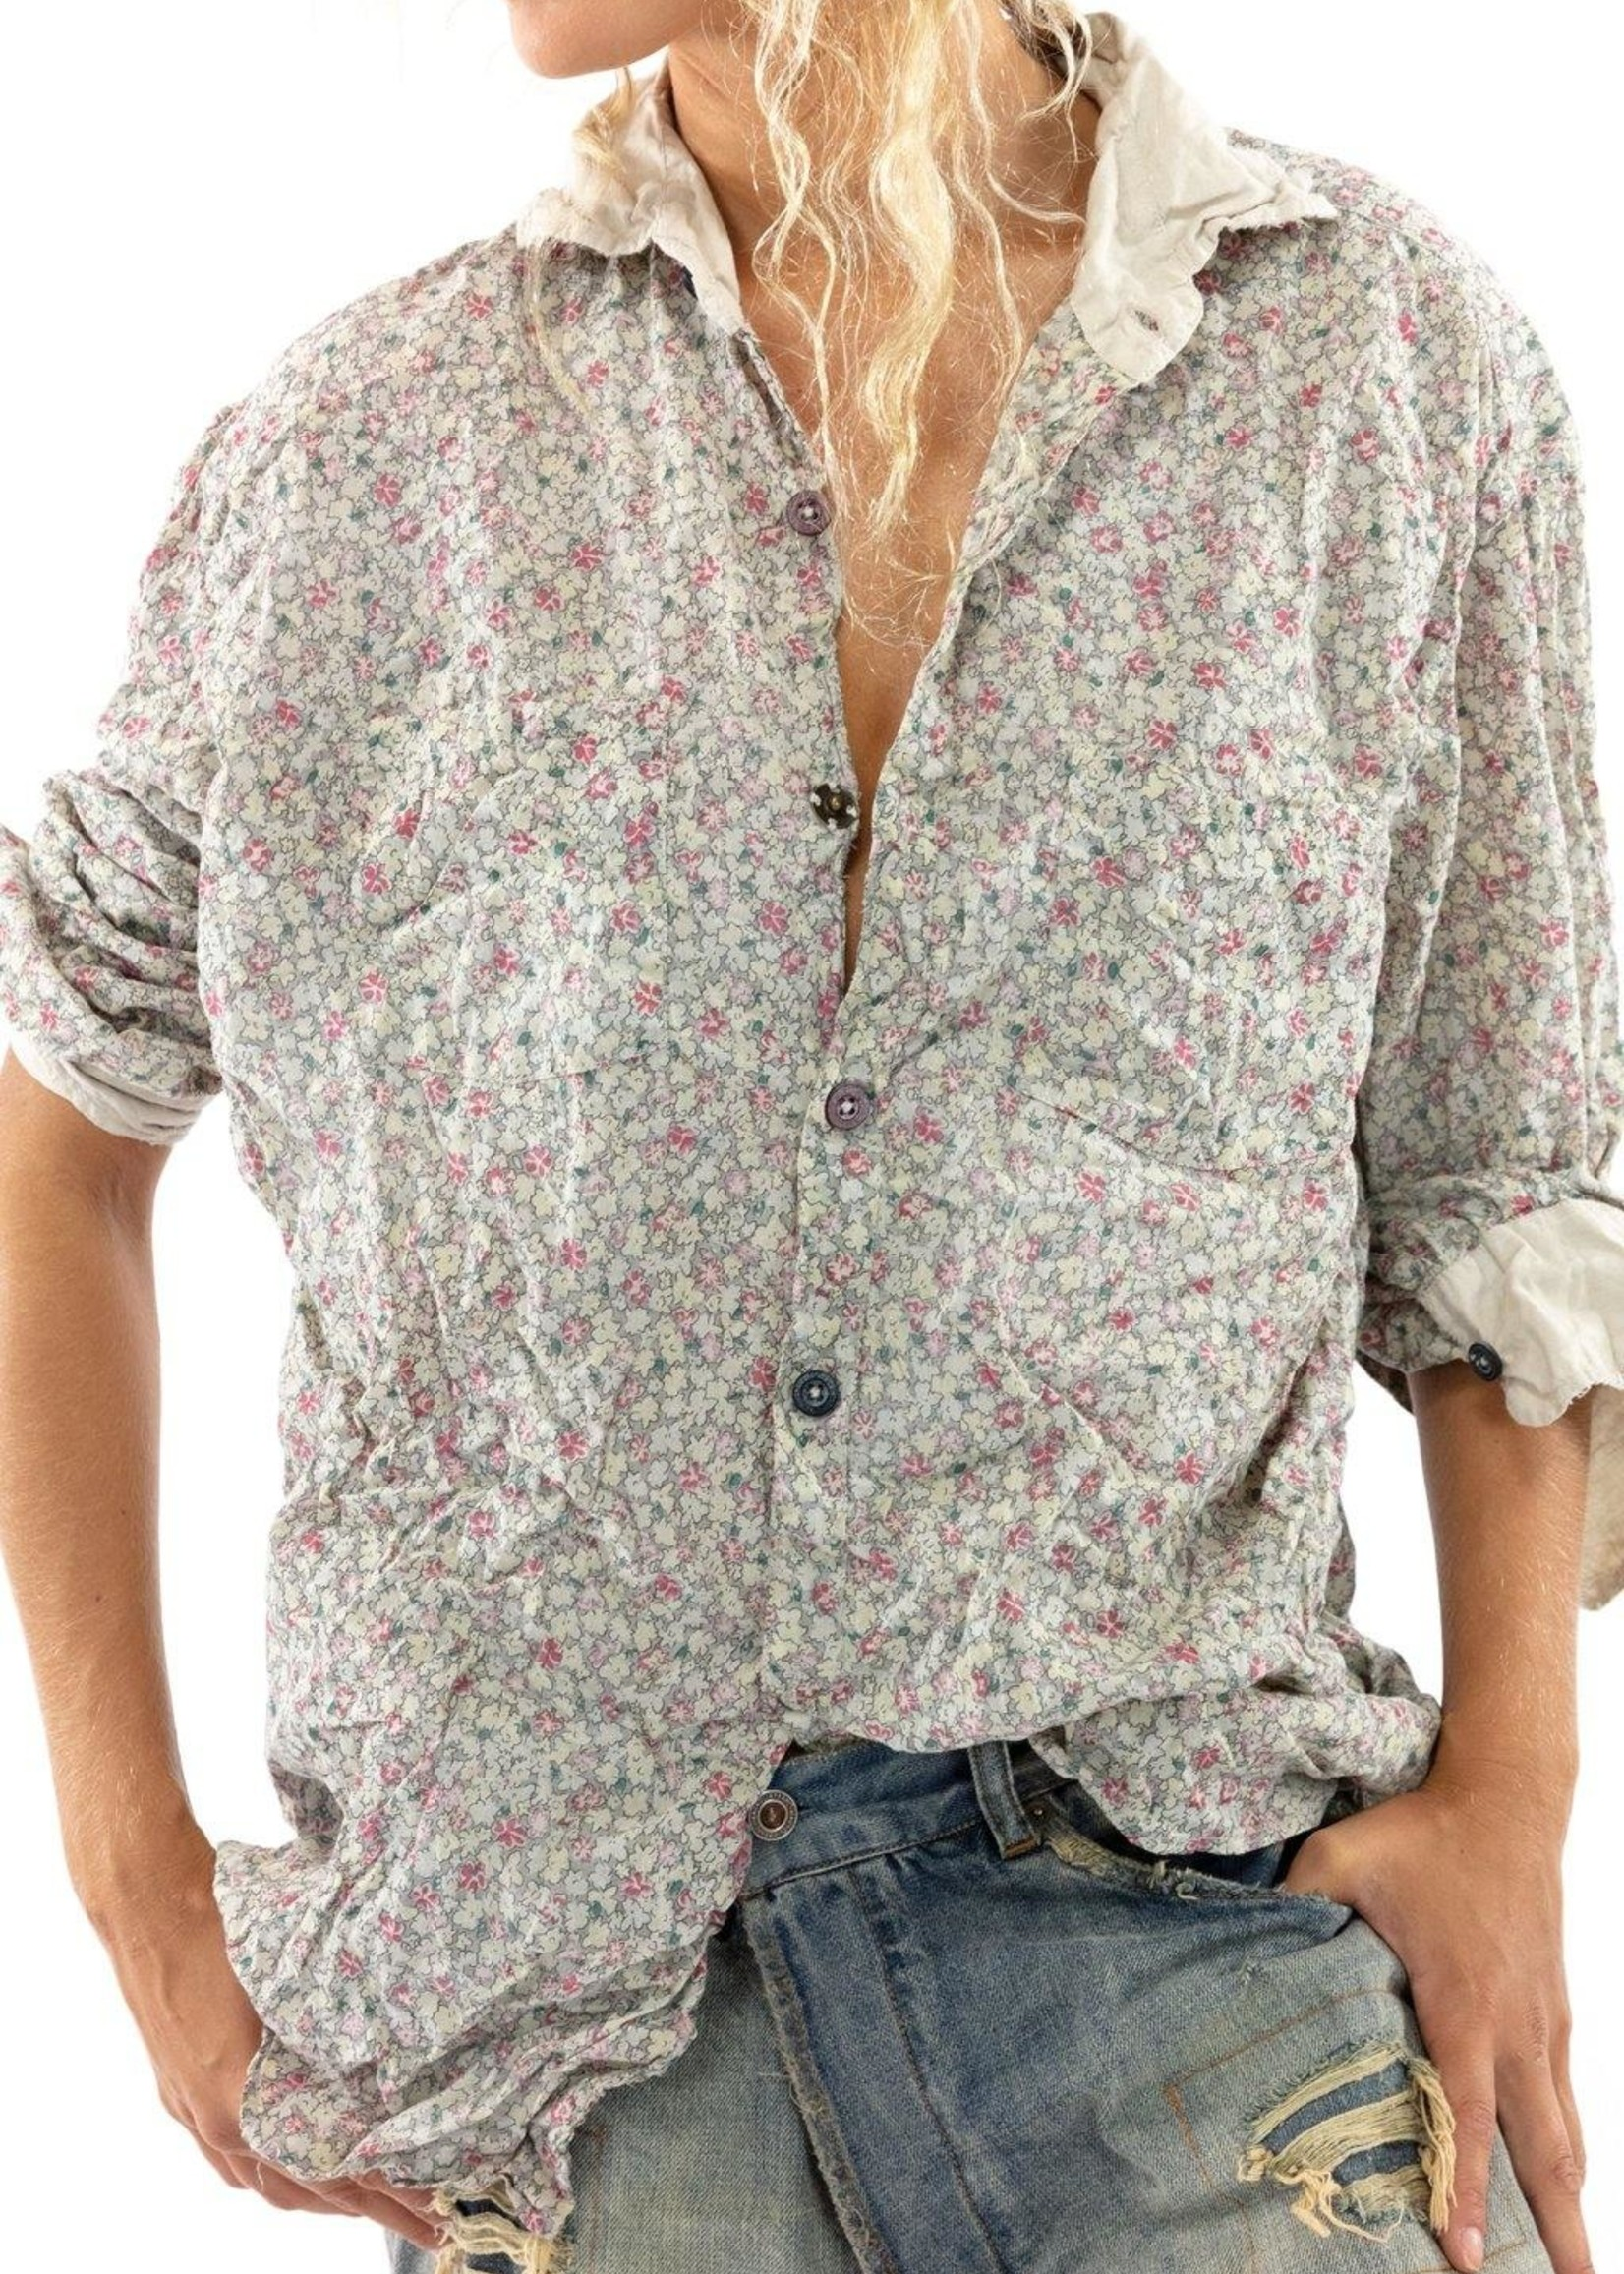 Magnolia Pearl Boyfriend Shirt - Georgia